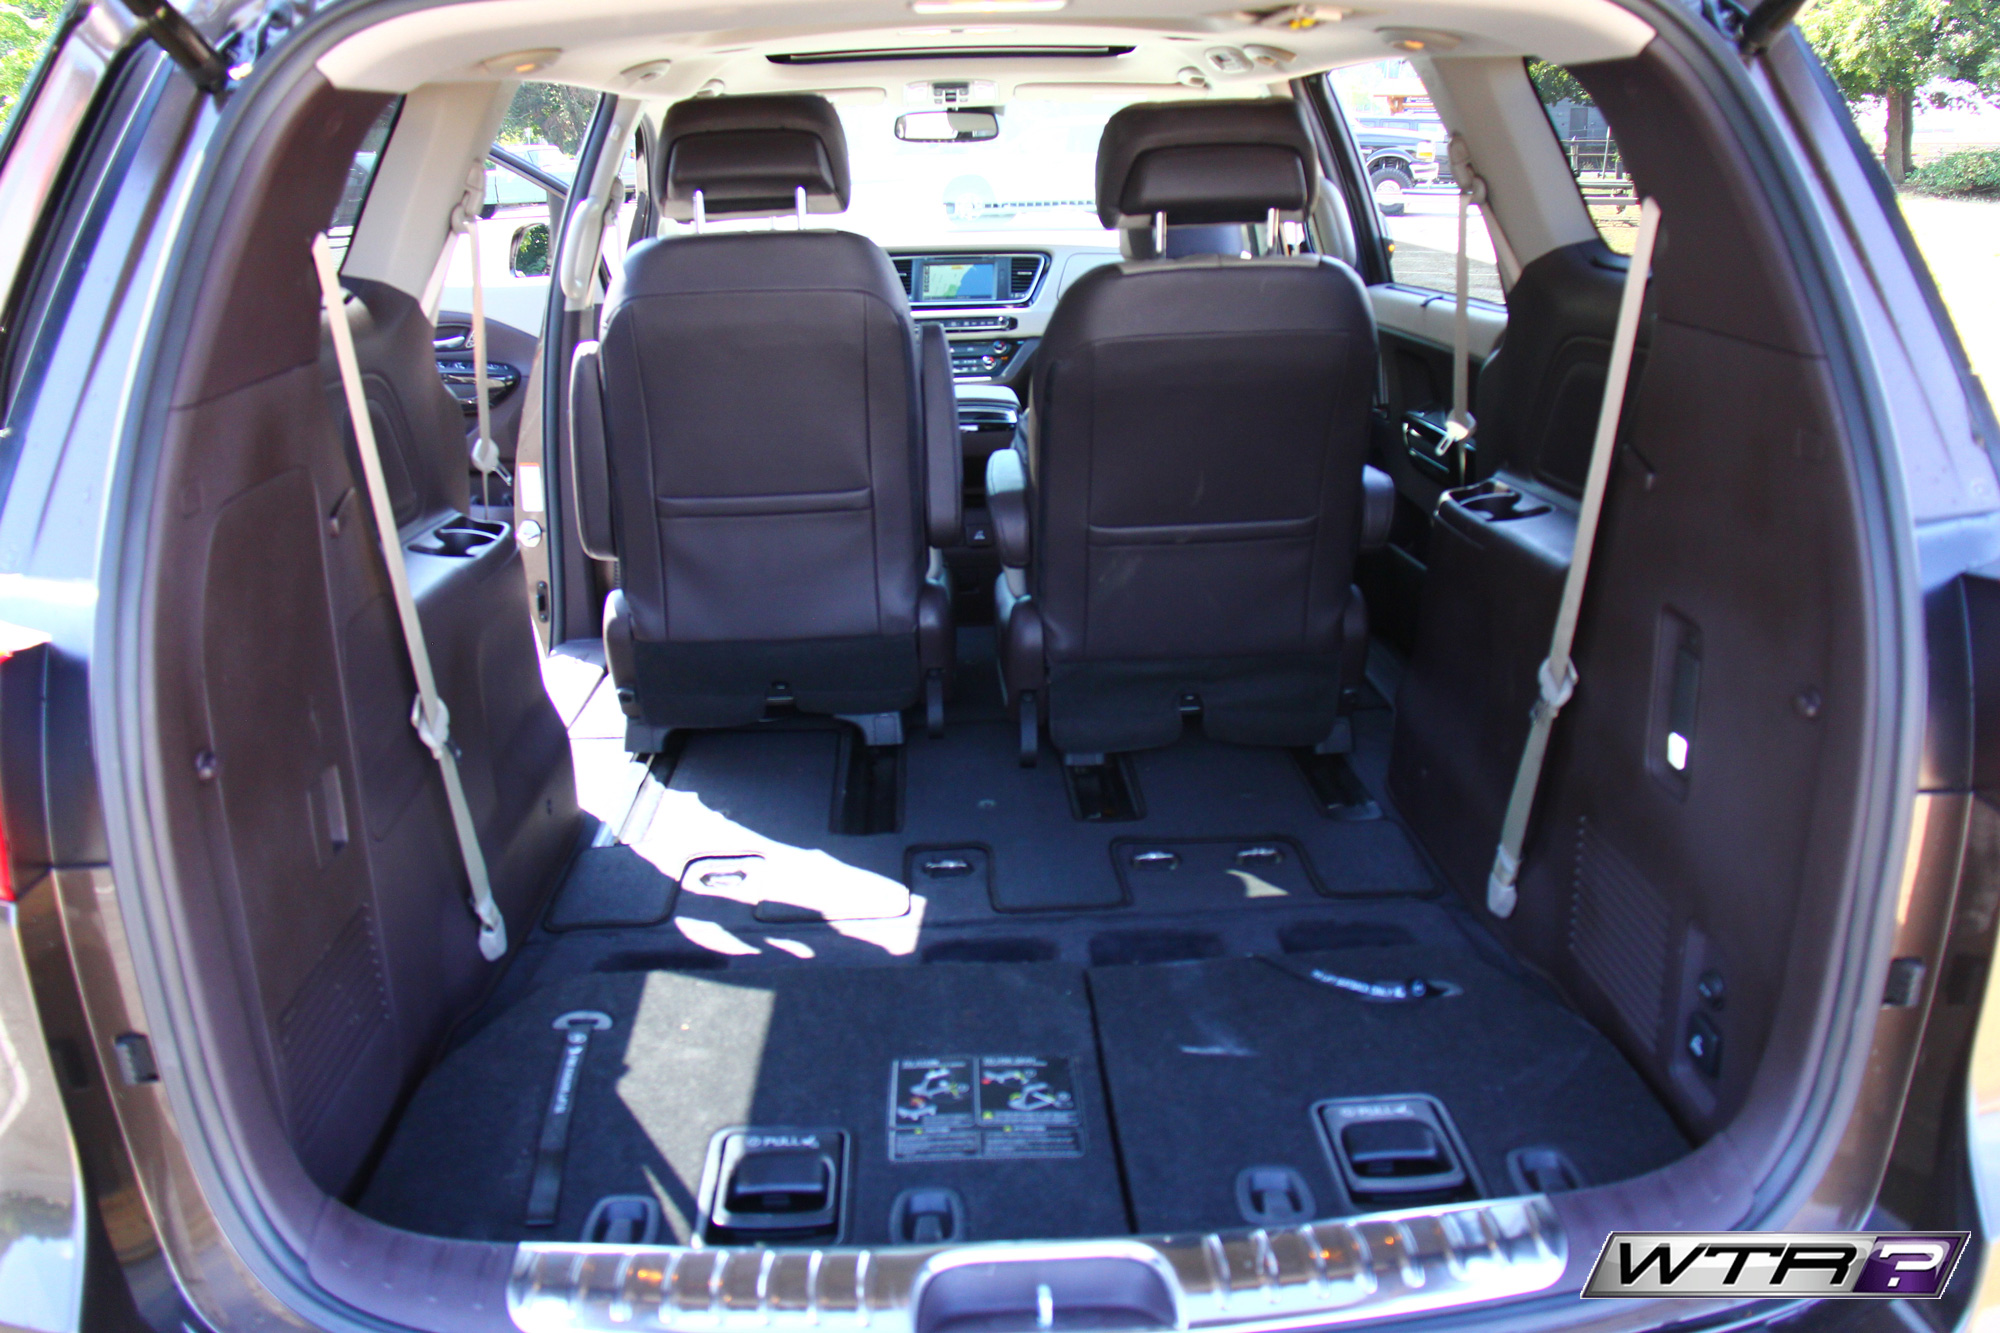 2016_kia_sedona_interior_seat_flat